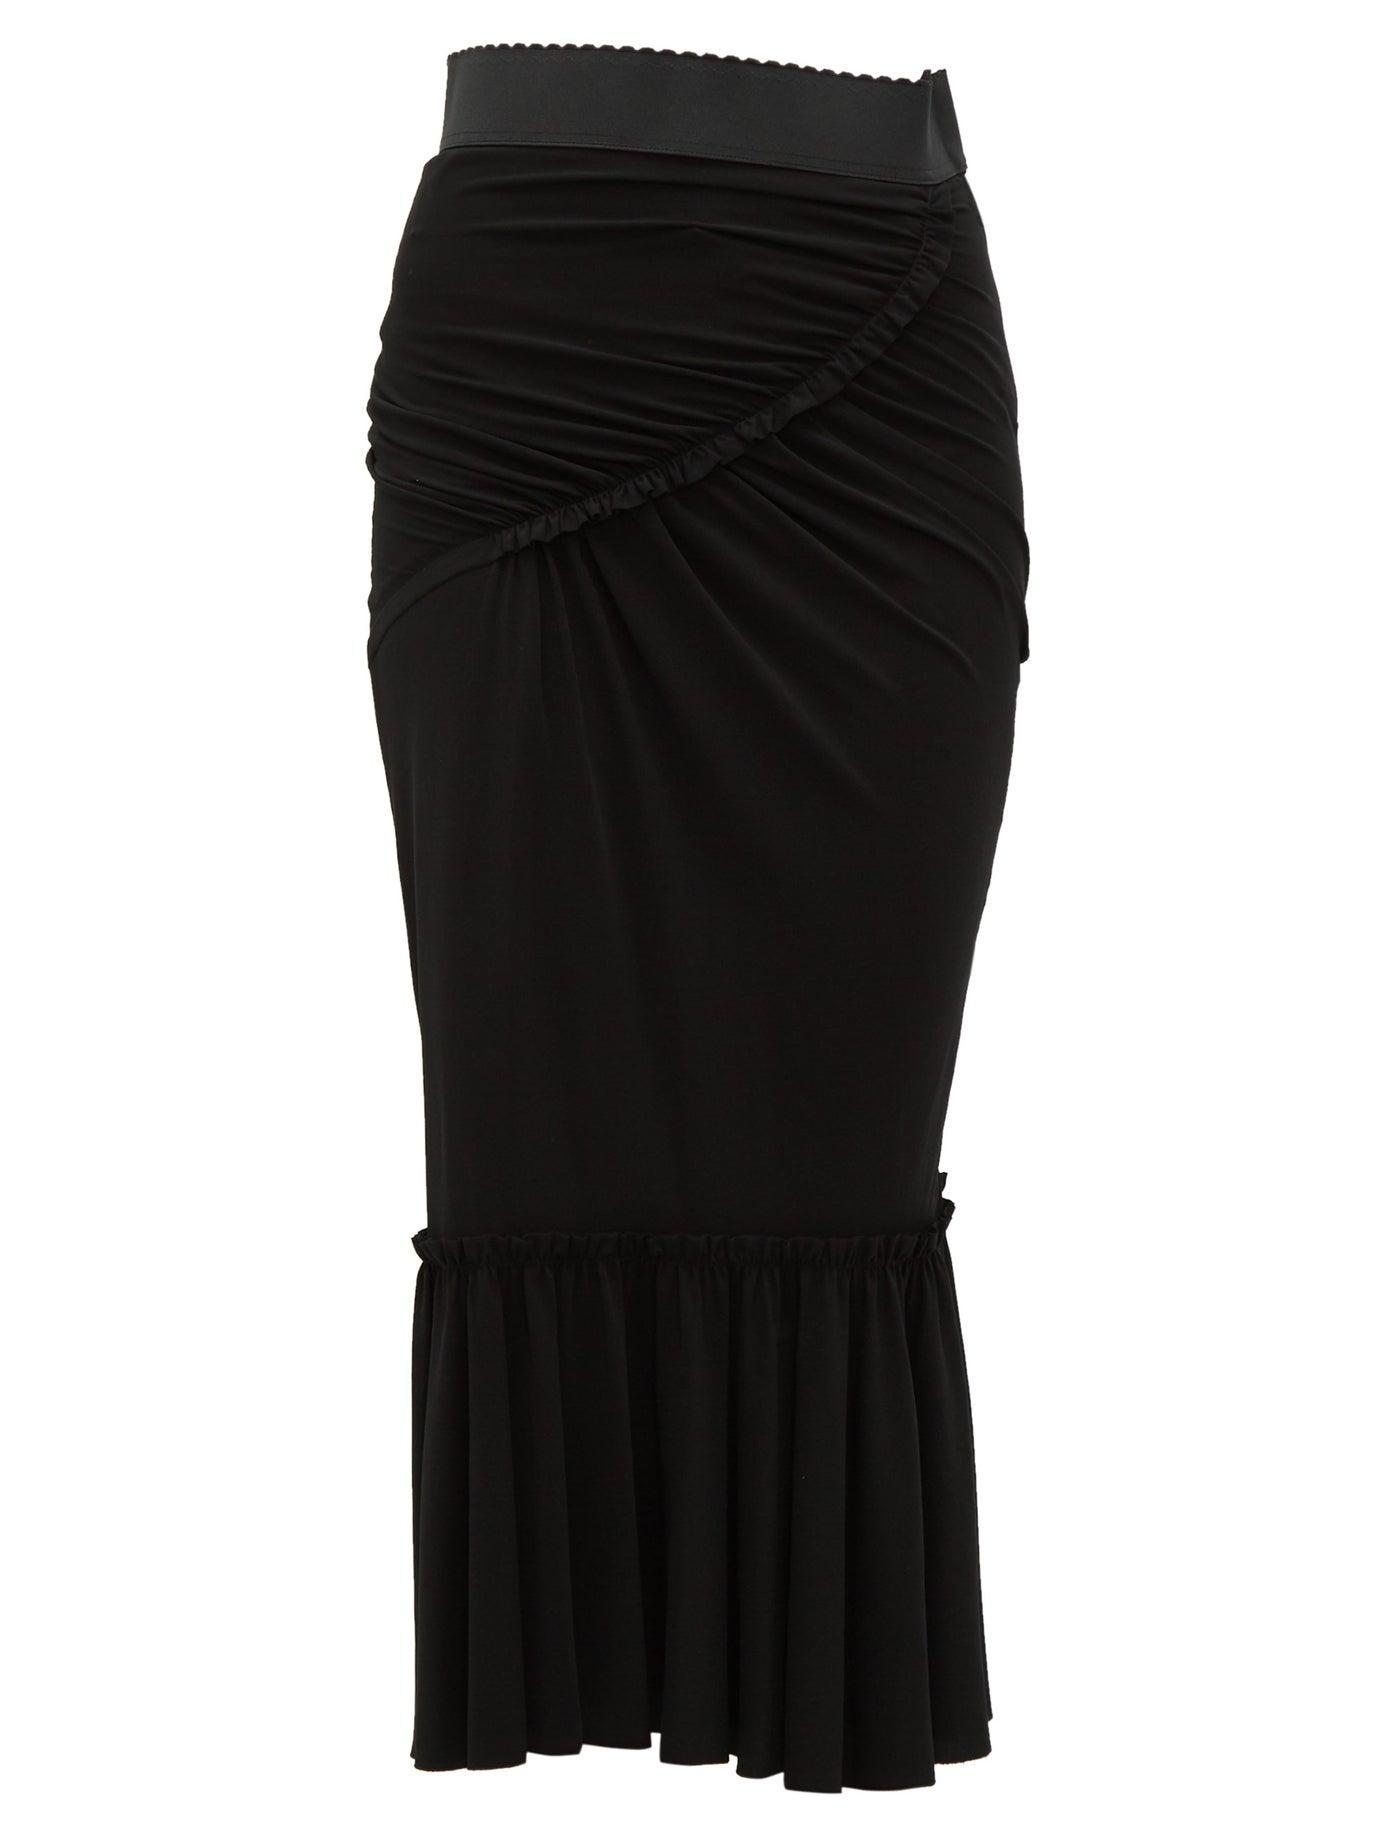 c5e3516bba Dolce & Gabbana Fishtail Midi Skirt in Black - Lyst